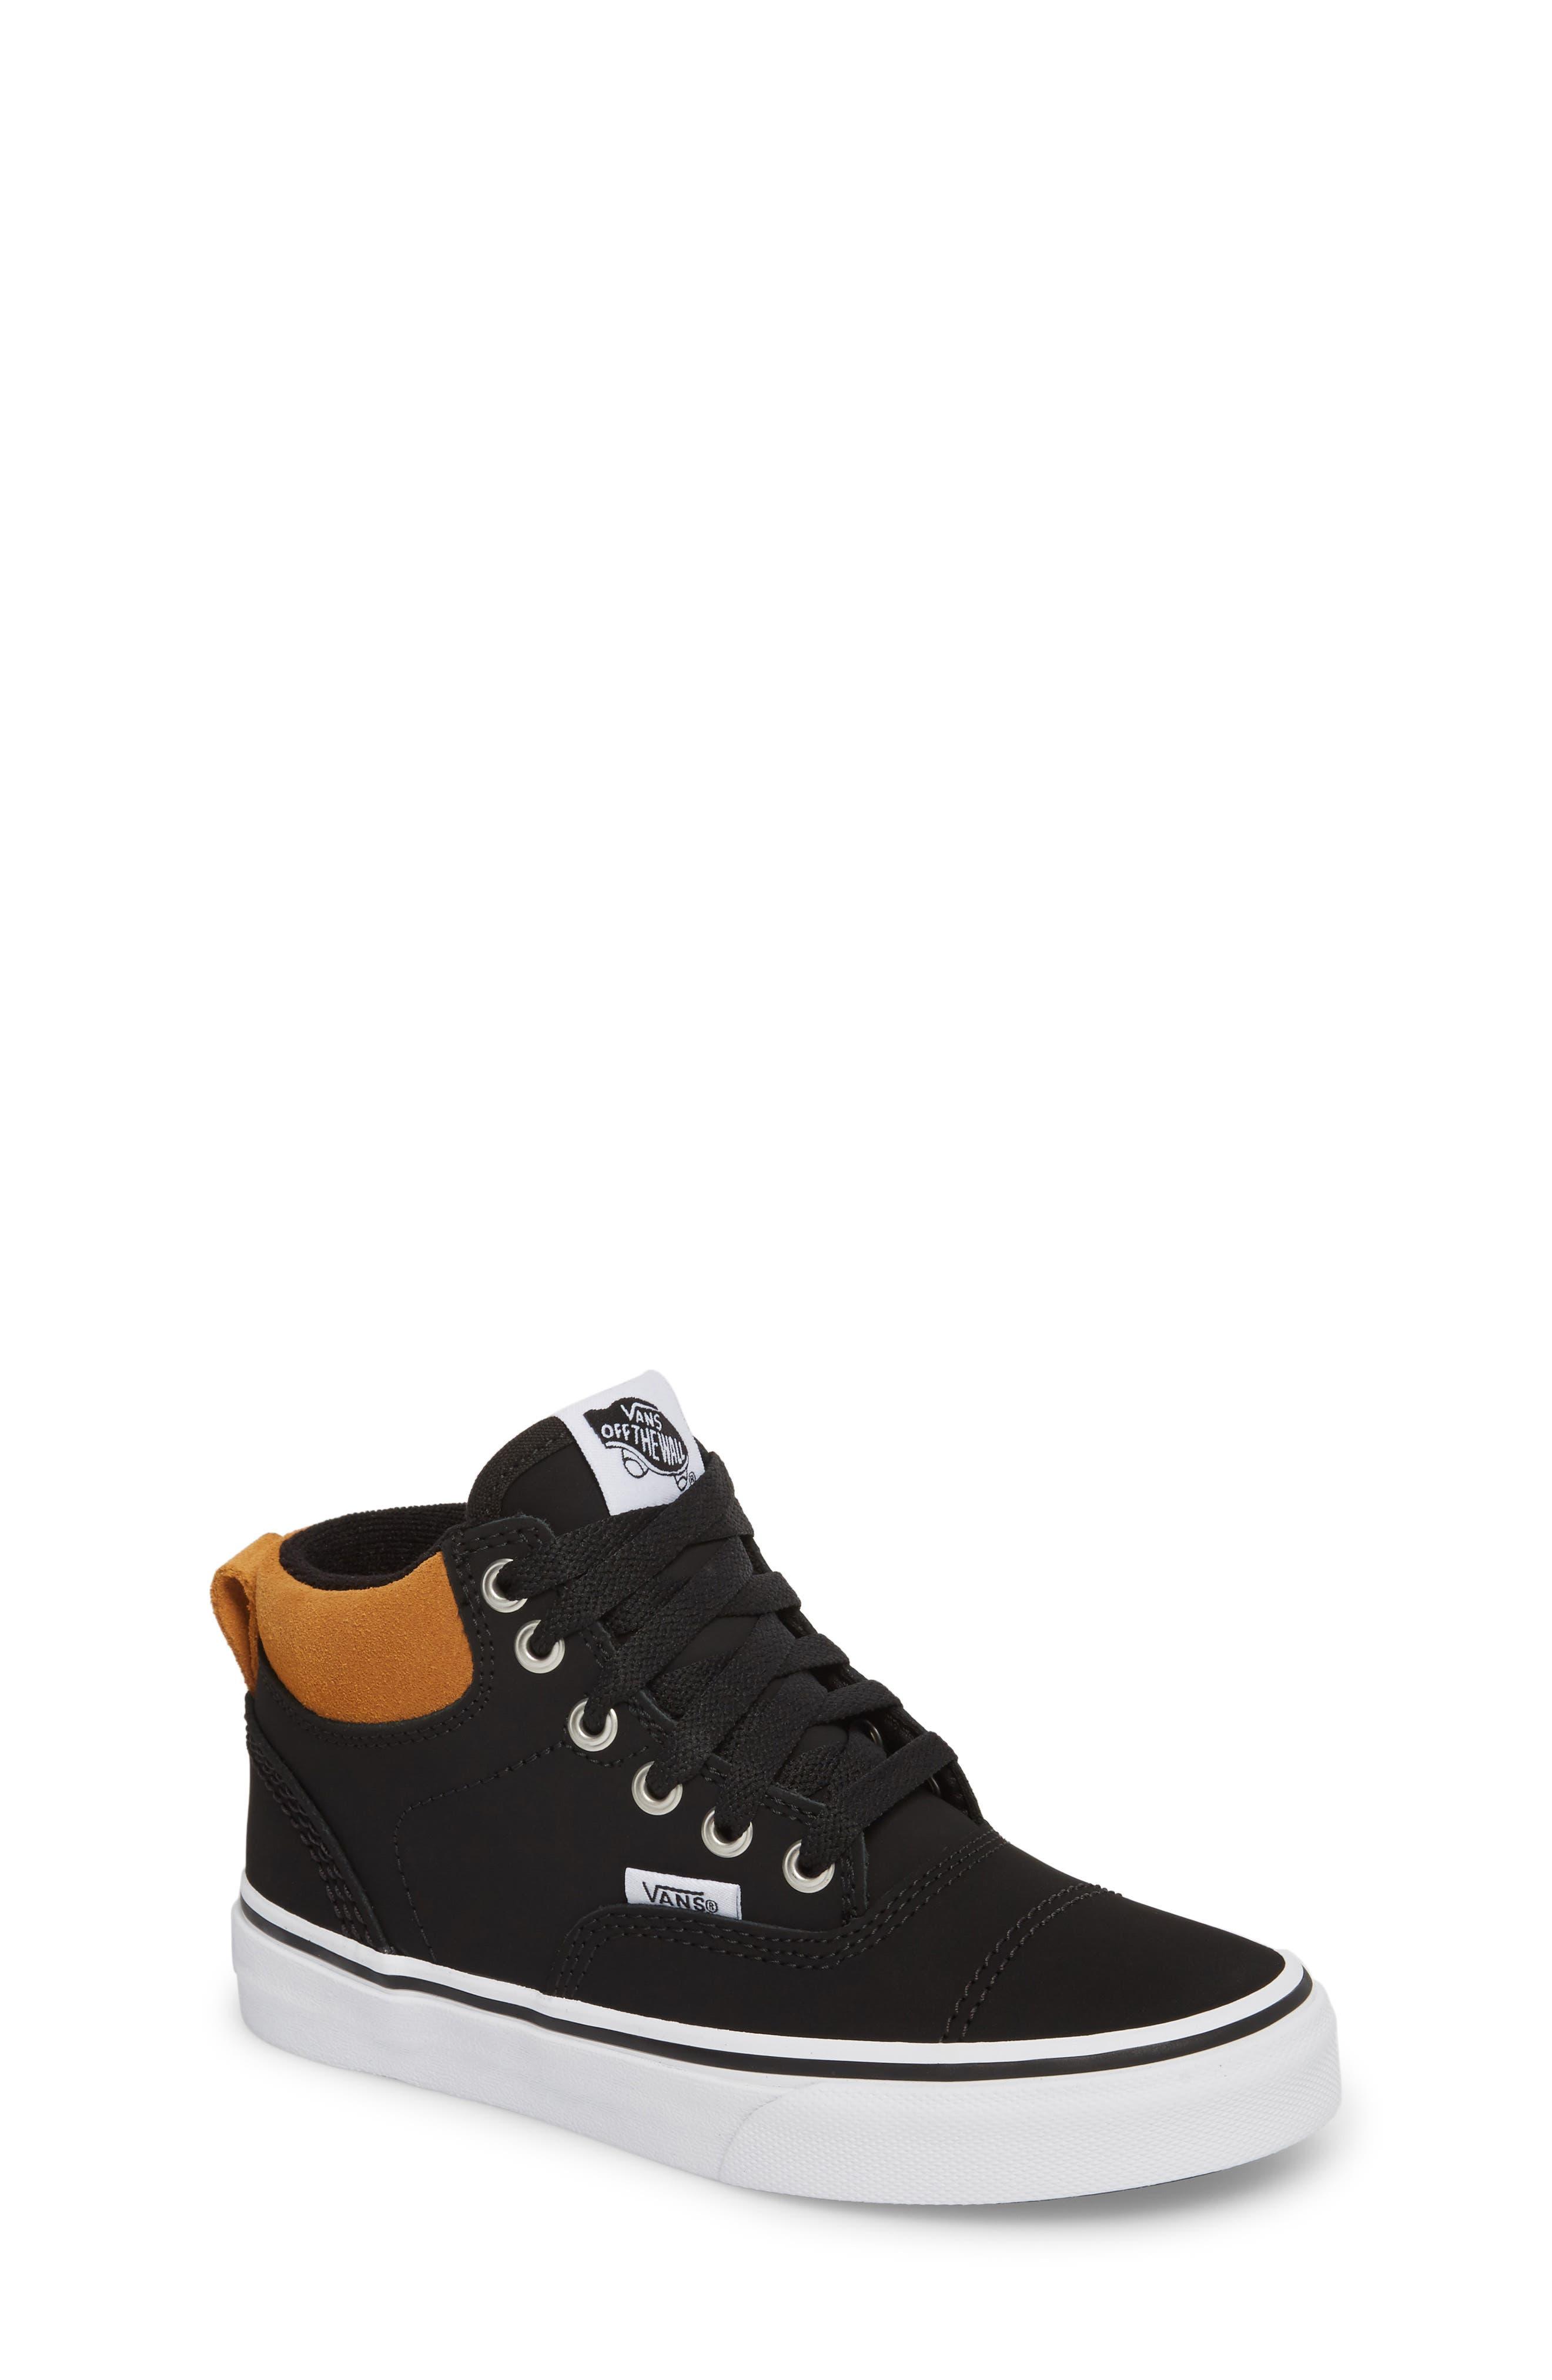 Era - Hi Sneaker,                         Main,                         color, Vansbuck Black/ Cathay Spice